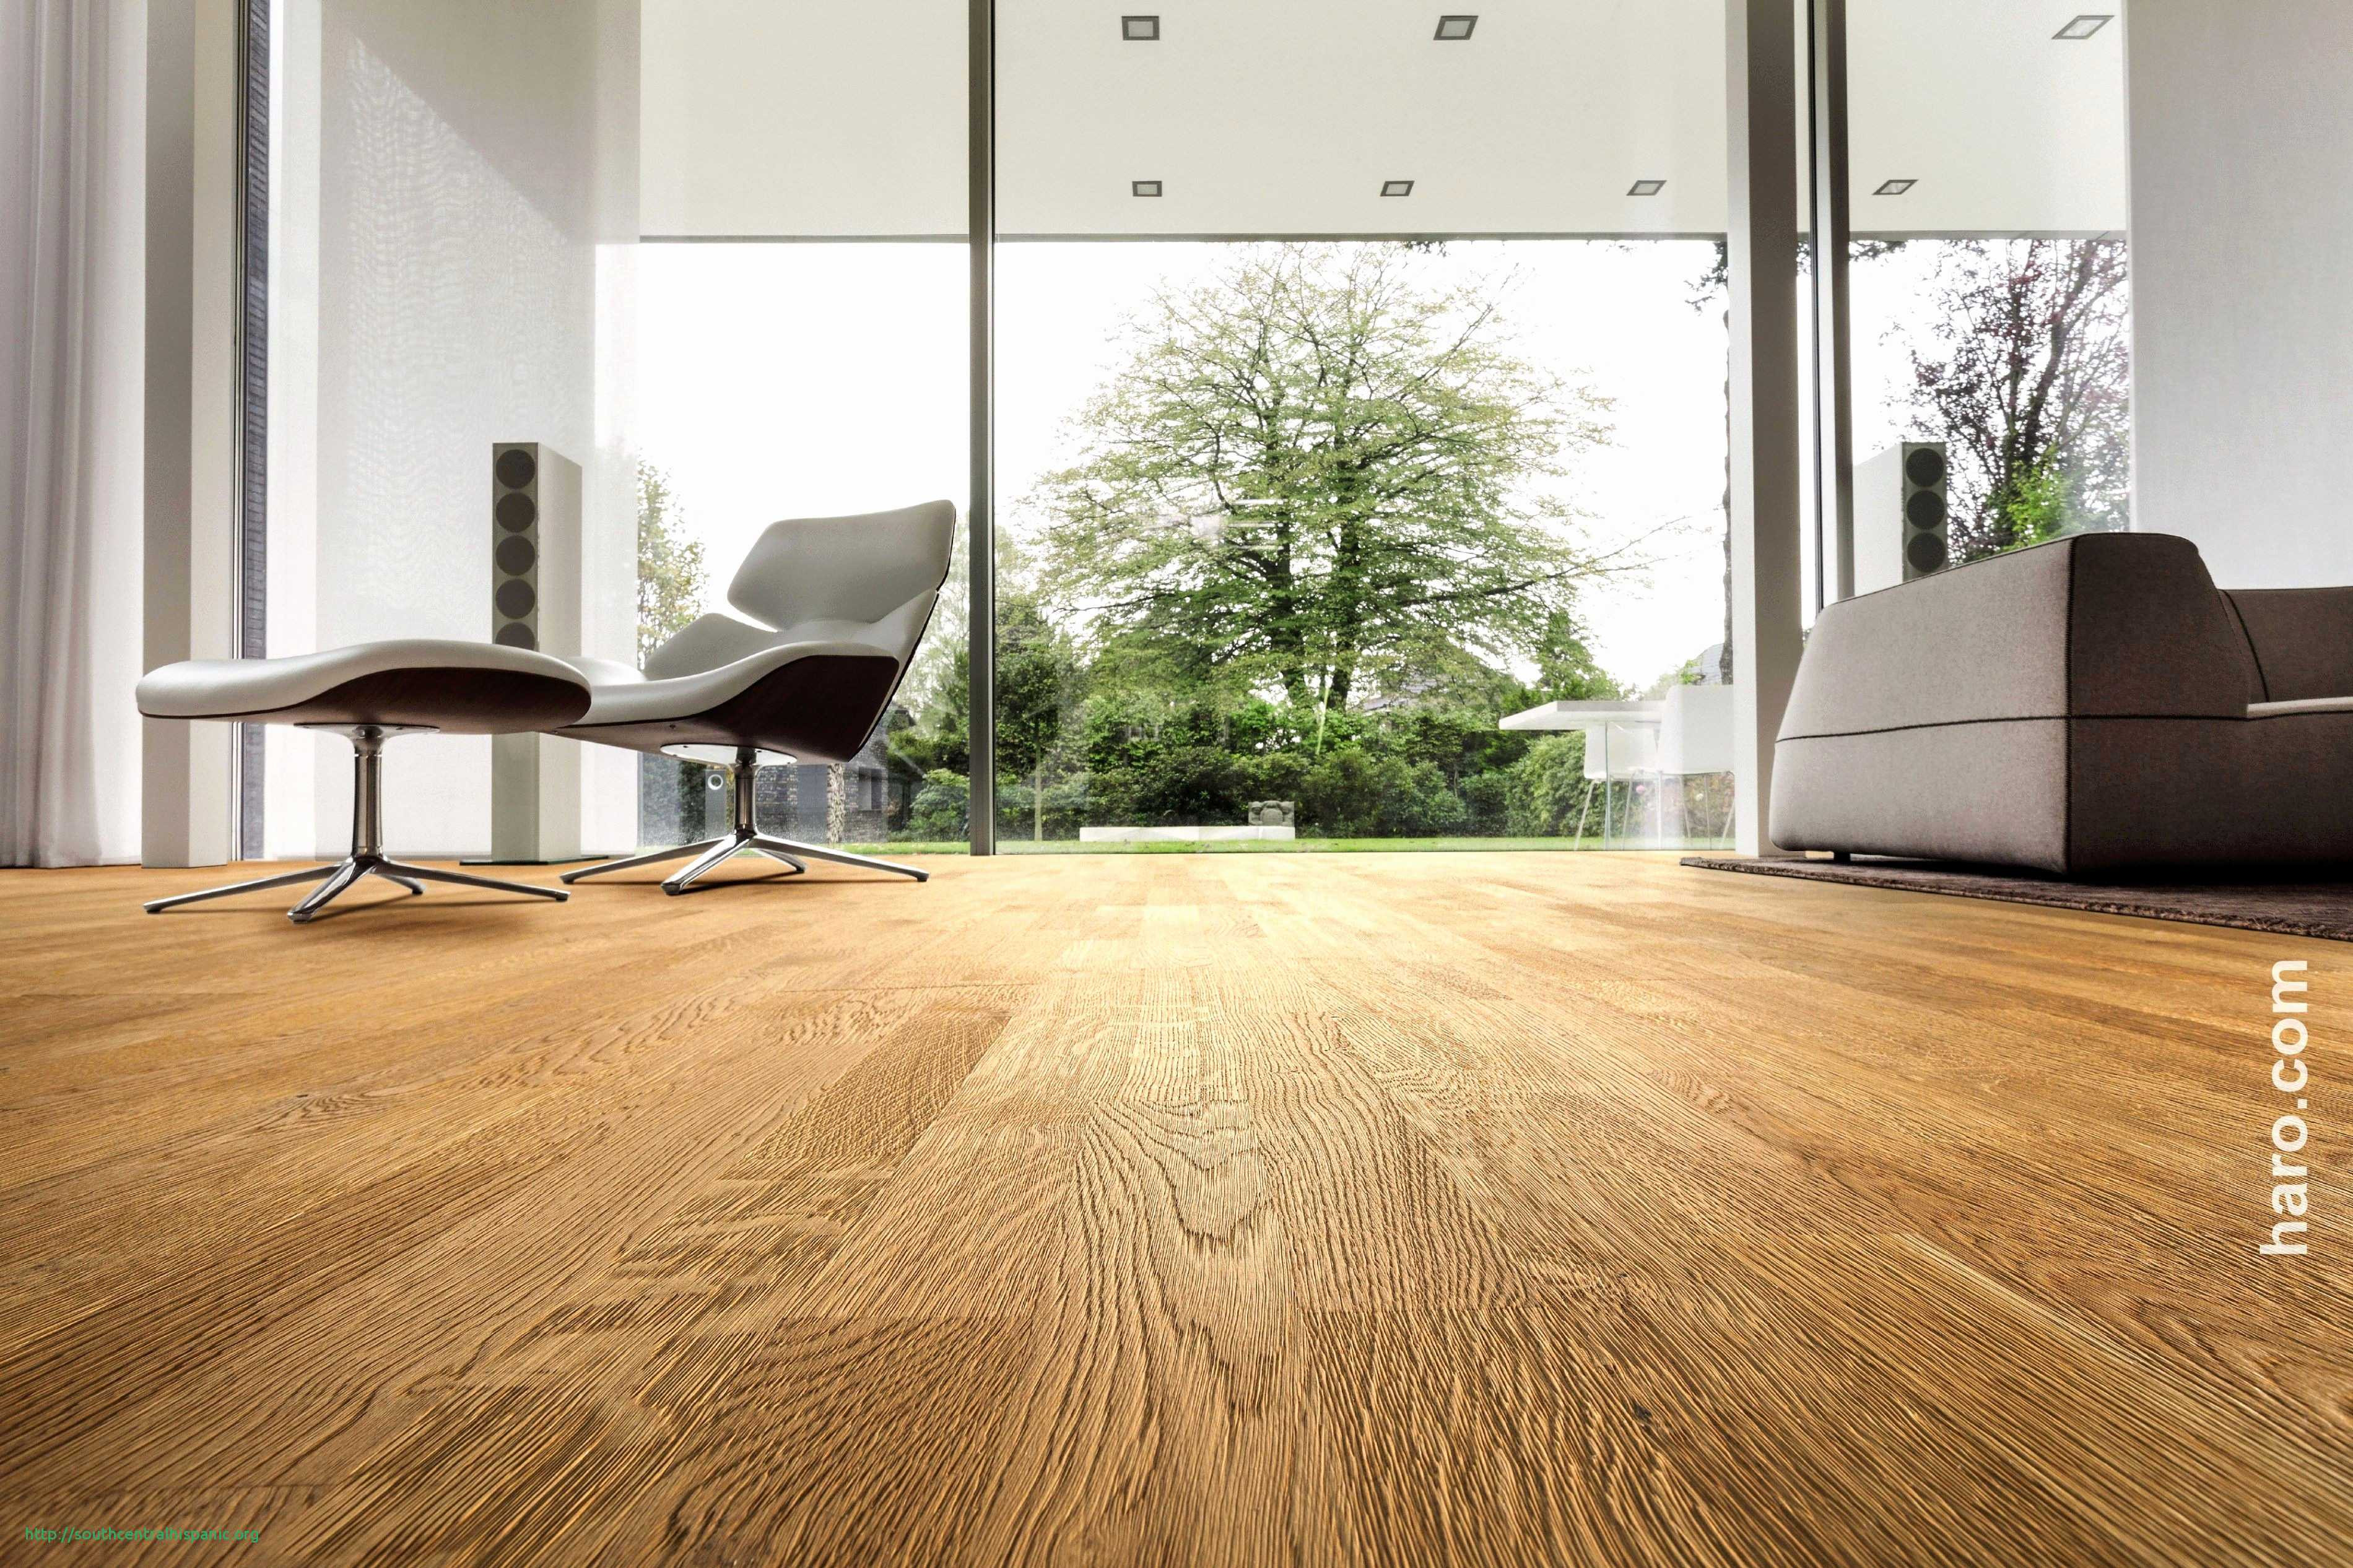 hardwood flooring prices of cheapest hardwood flooring 17 luxe where to buy hardwood flooring in cheapest hardwood flooring 17 luxe where to buy hardwood flooring cheap